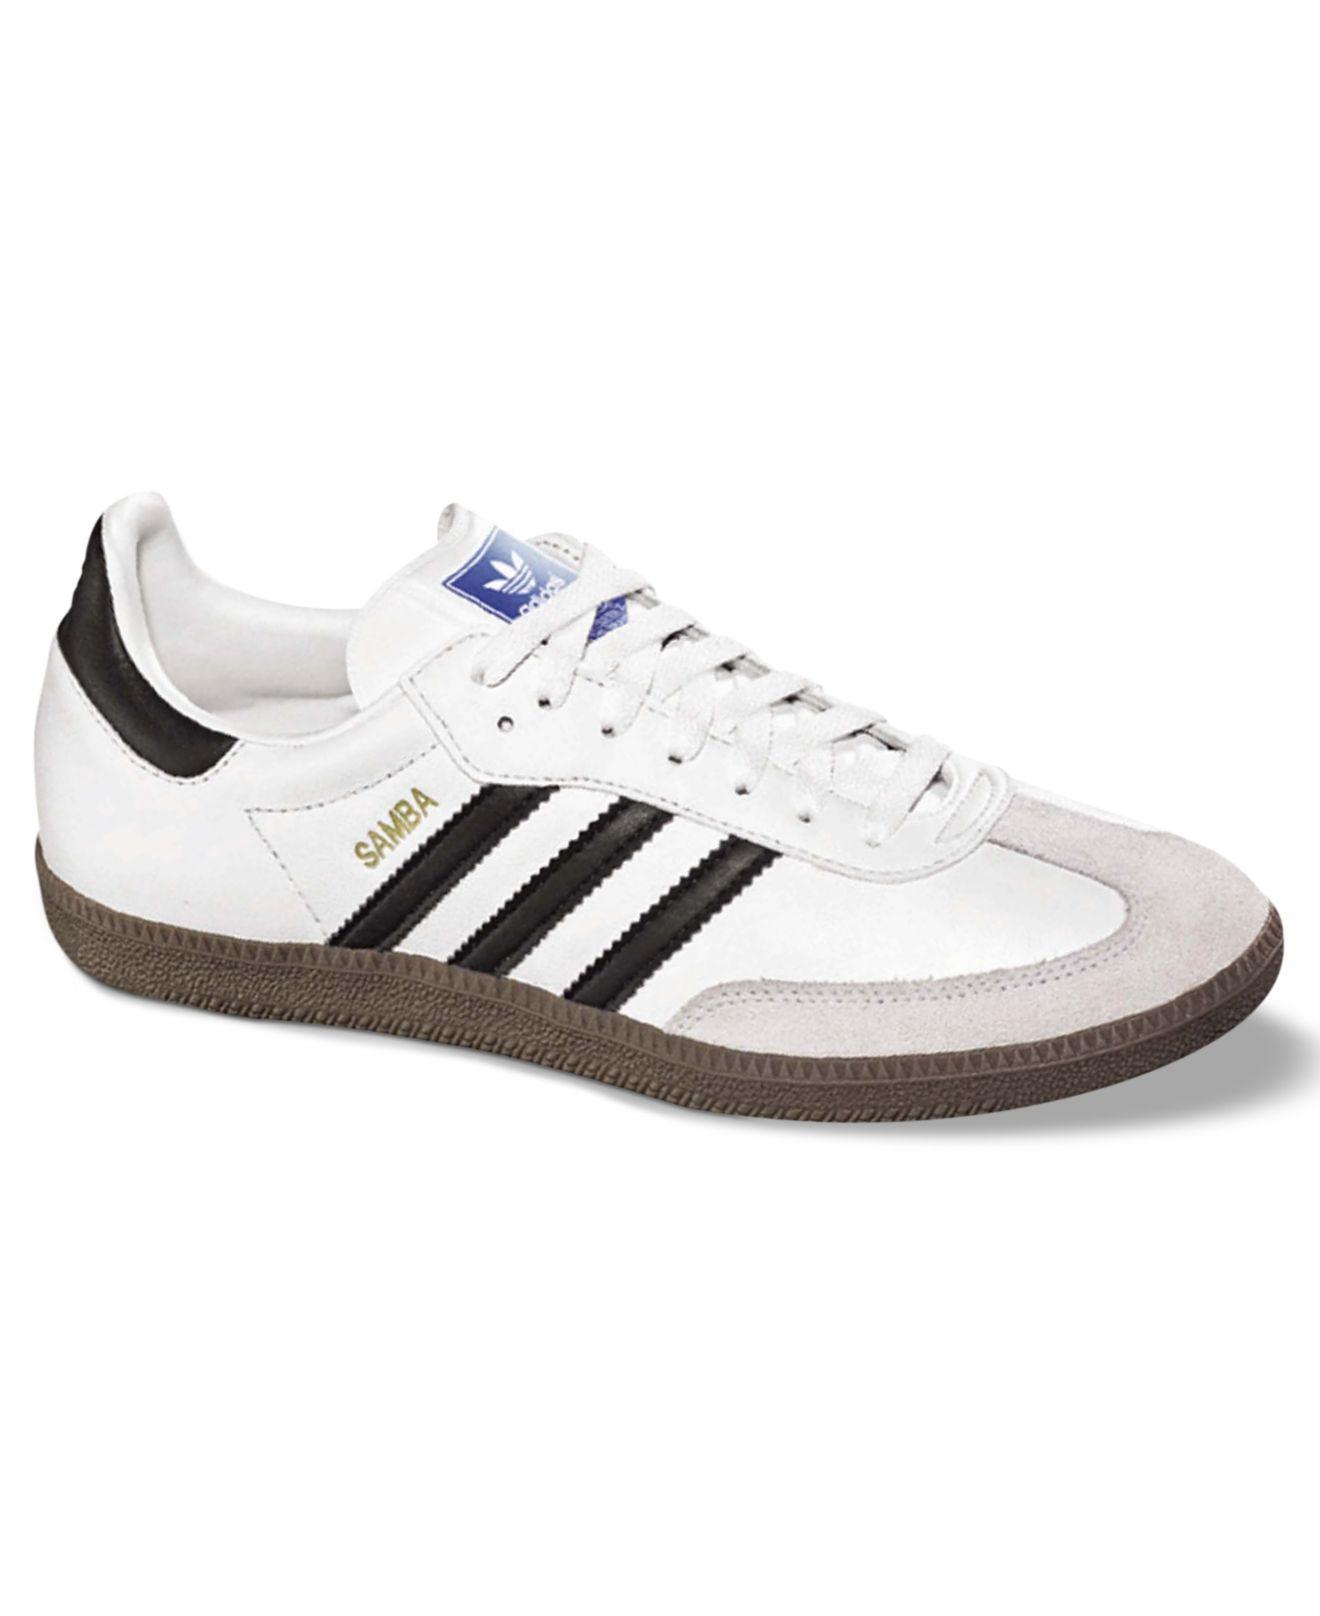 d4dcfb664 Lyst - adidas Originals Men's Originals Leather Samba Sneakers From ...